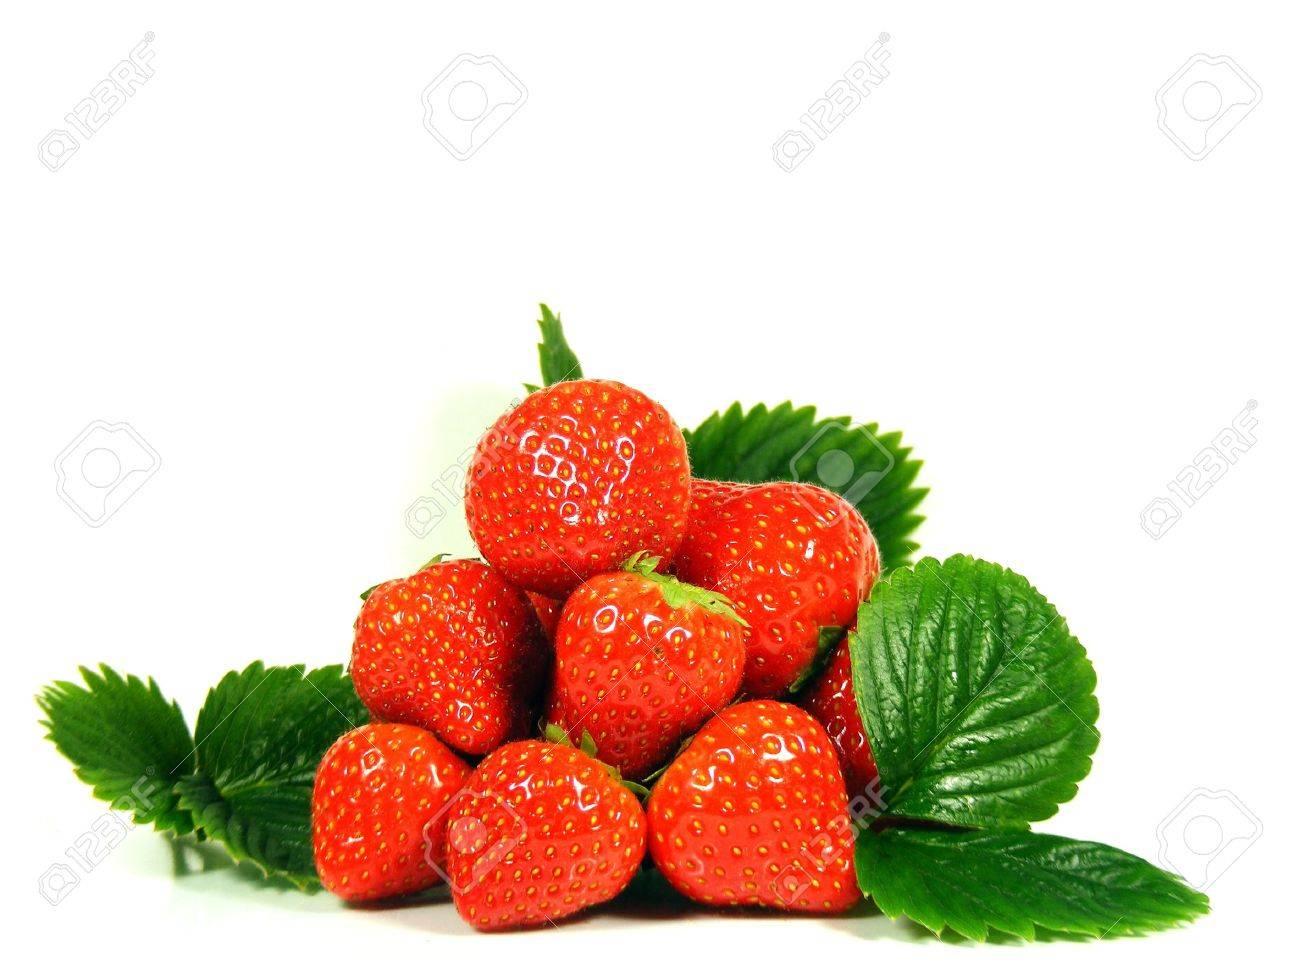 Isolated fruits fresh Strawberries Stock Photo - 11050766